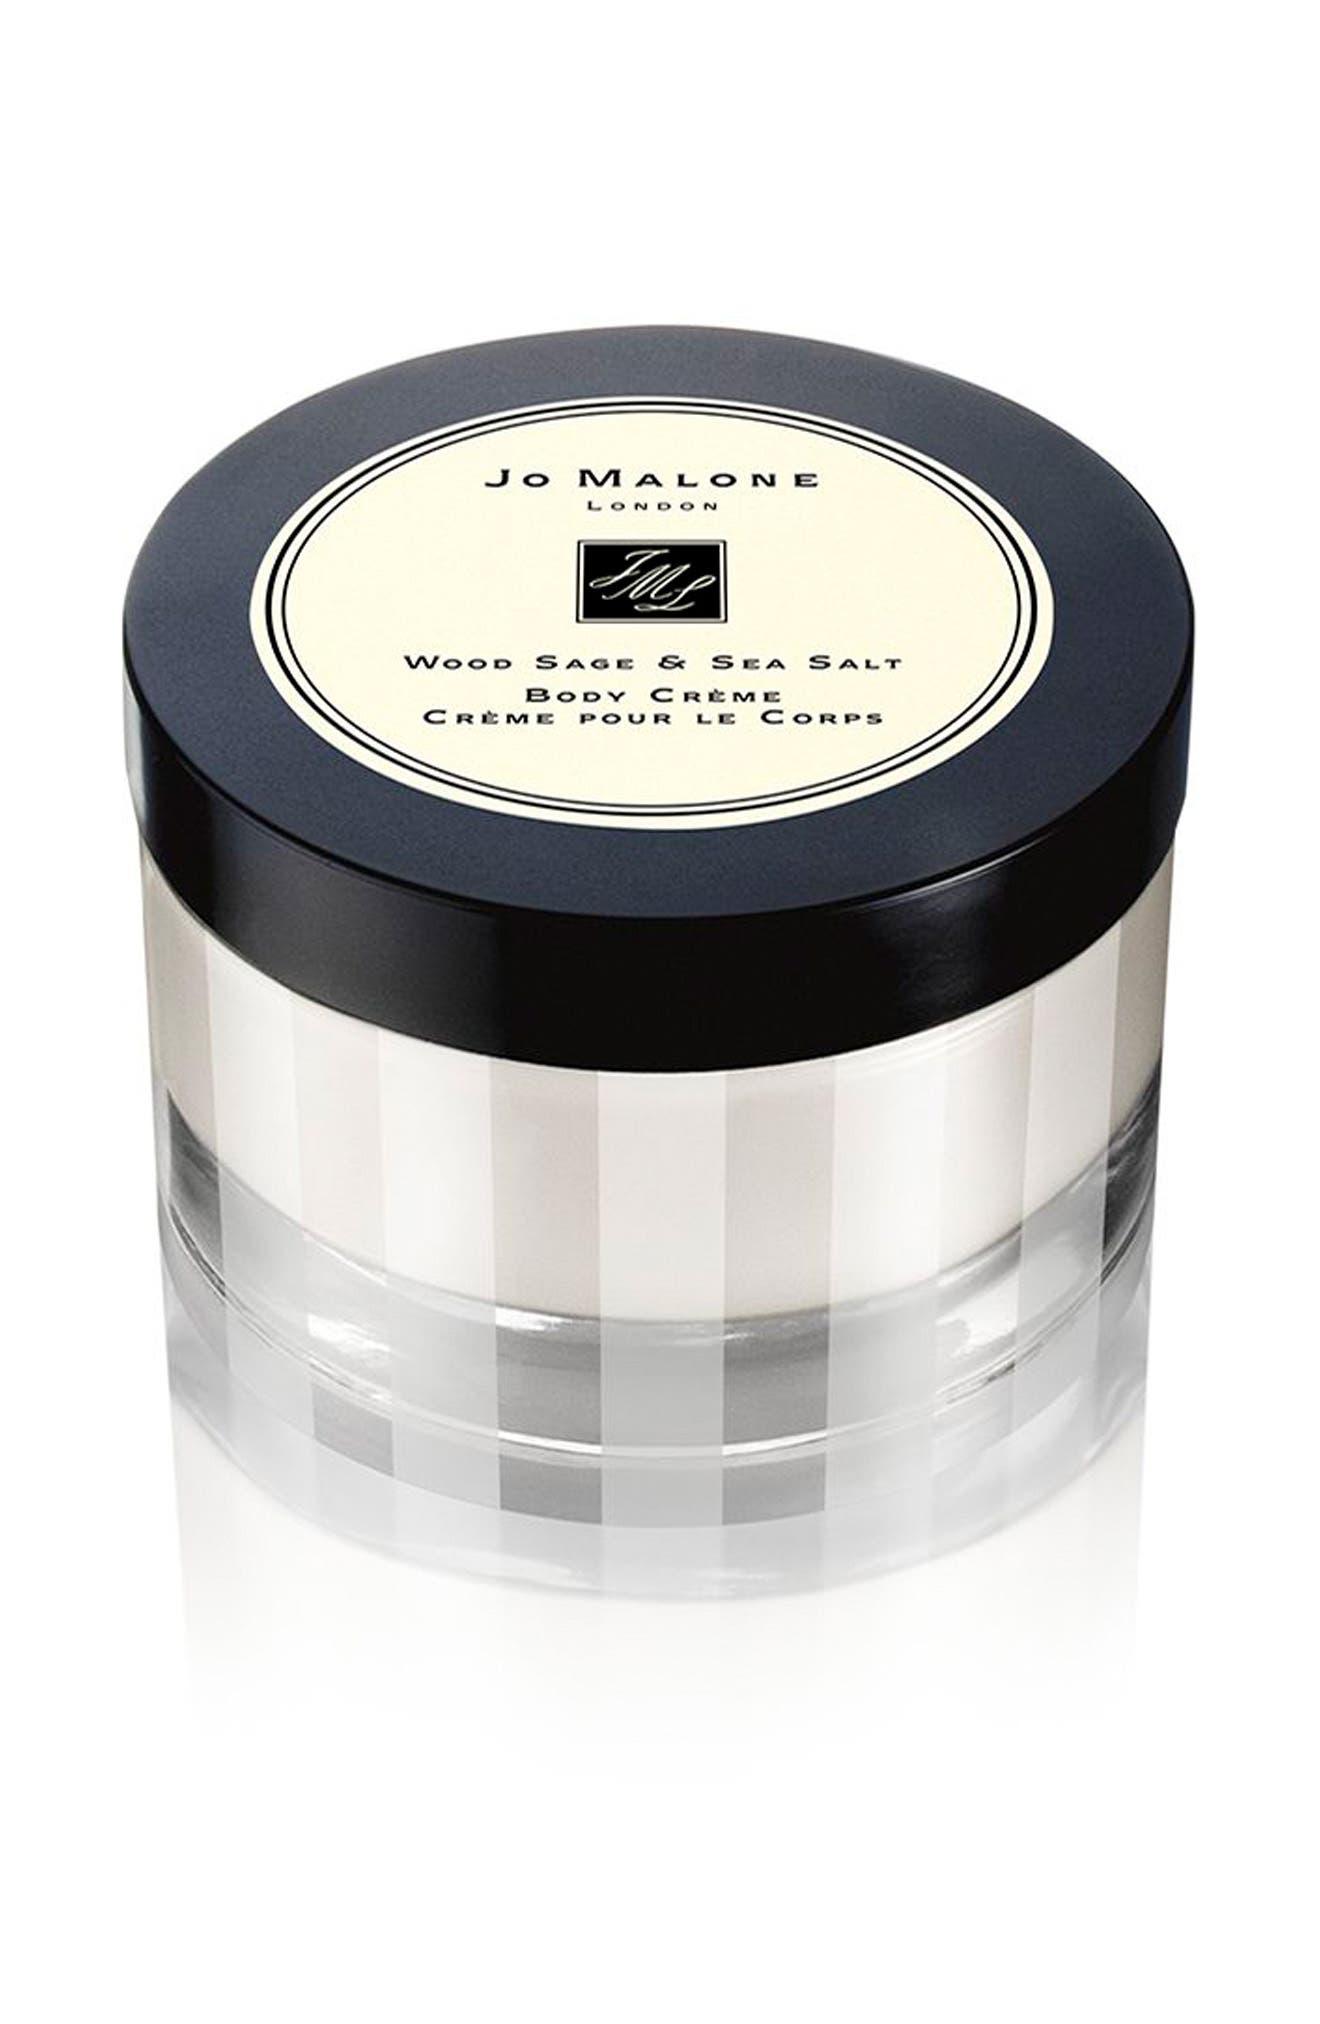 Alternate Image 1 Selected - Jo Malone London™ Wood Sage & Sea Salt Body Cream